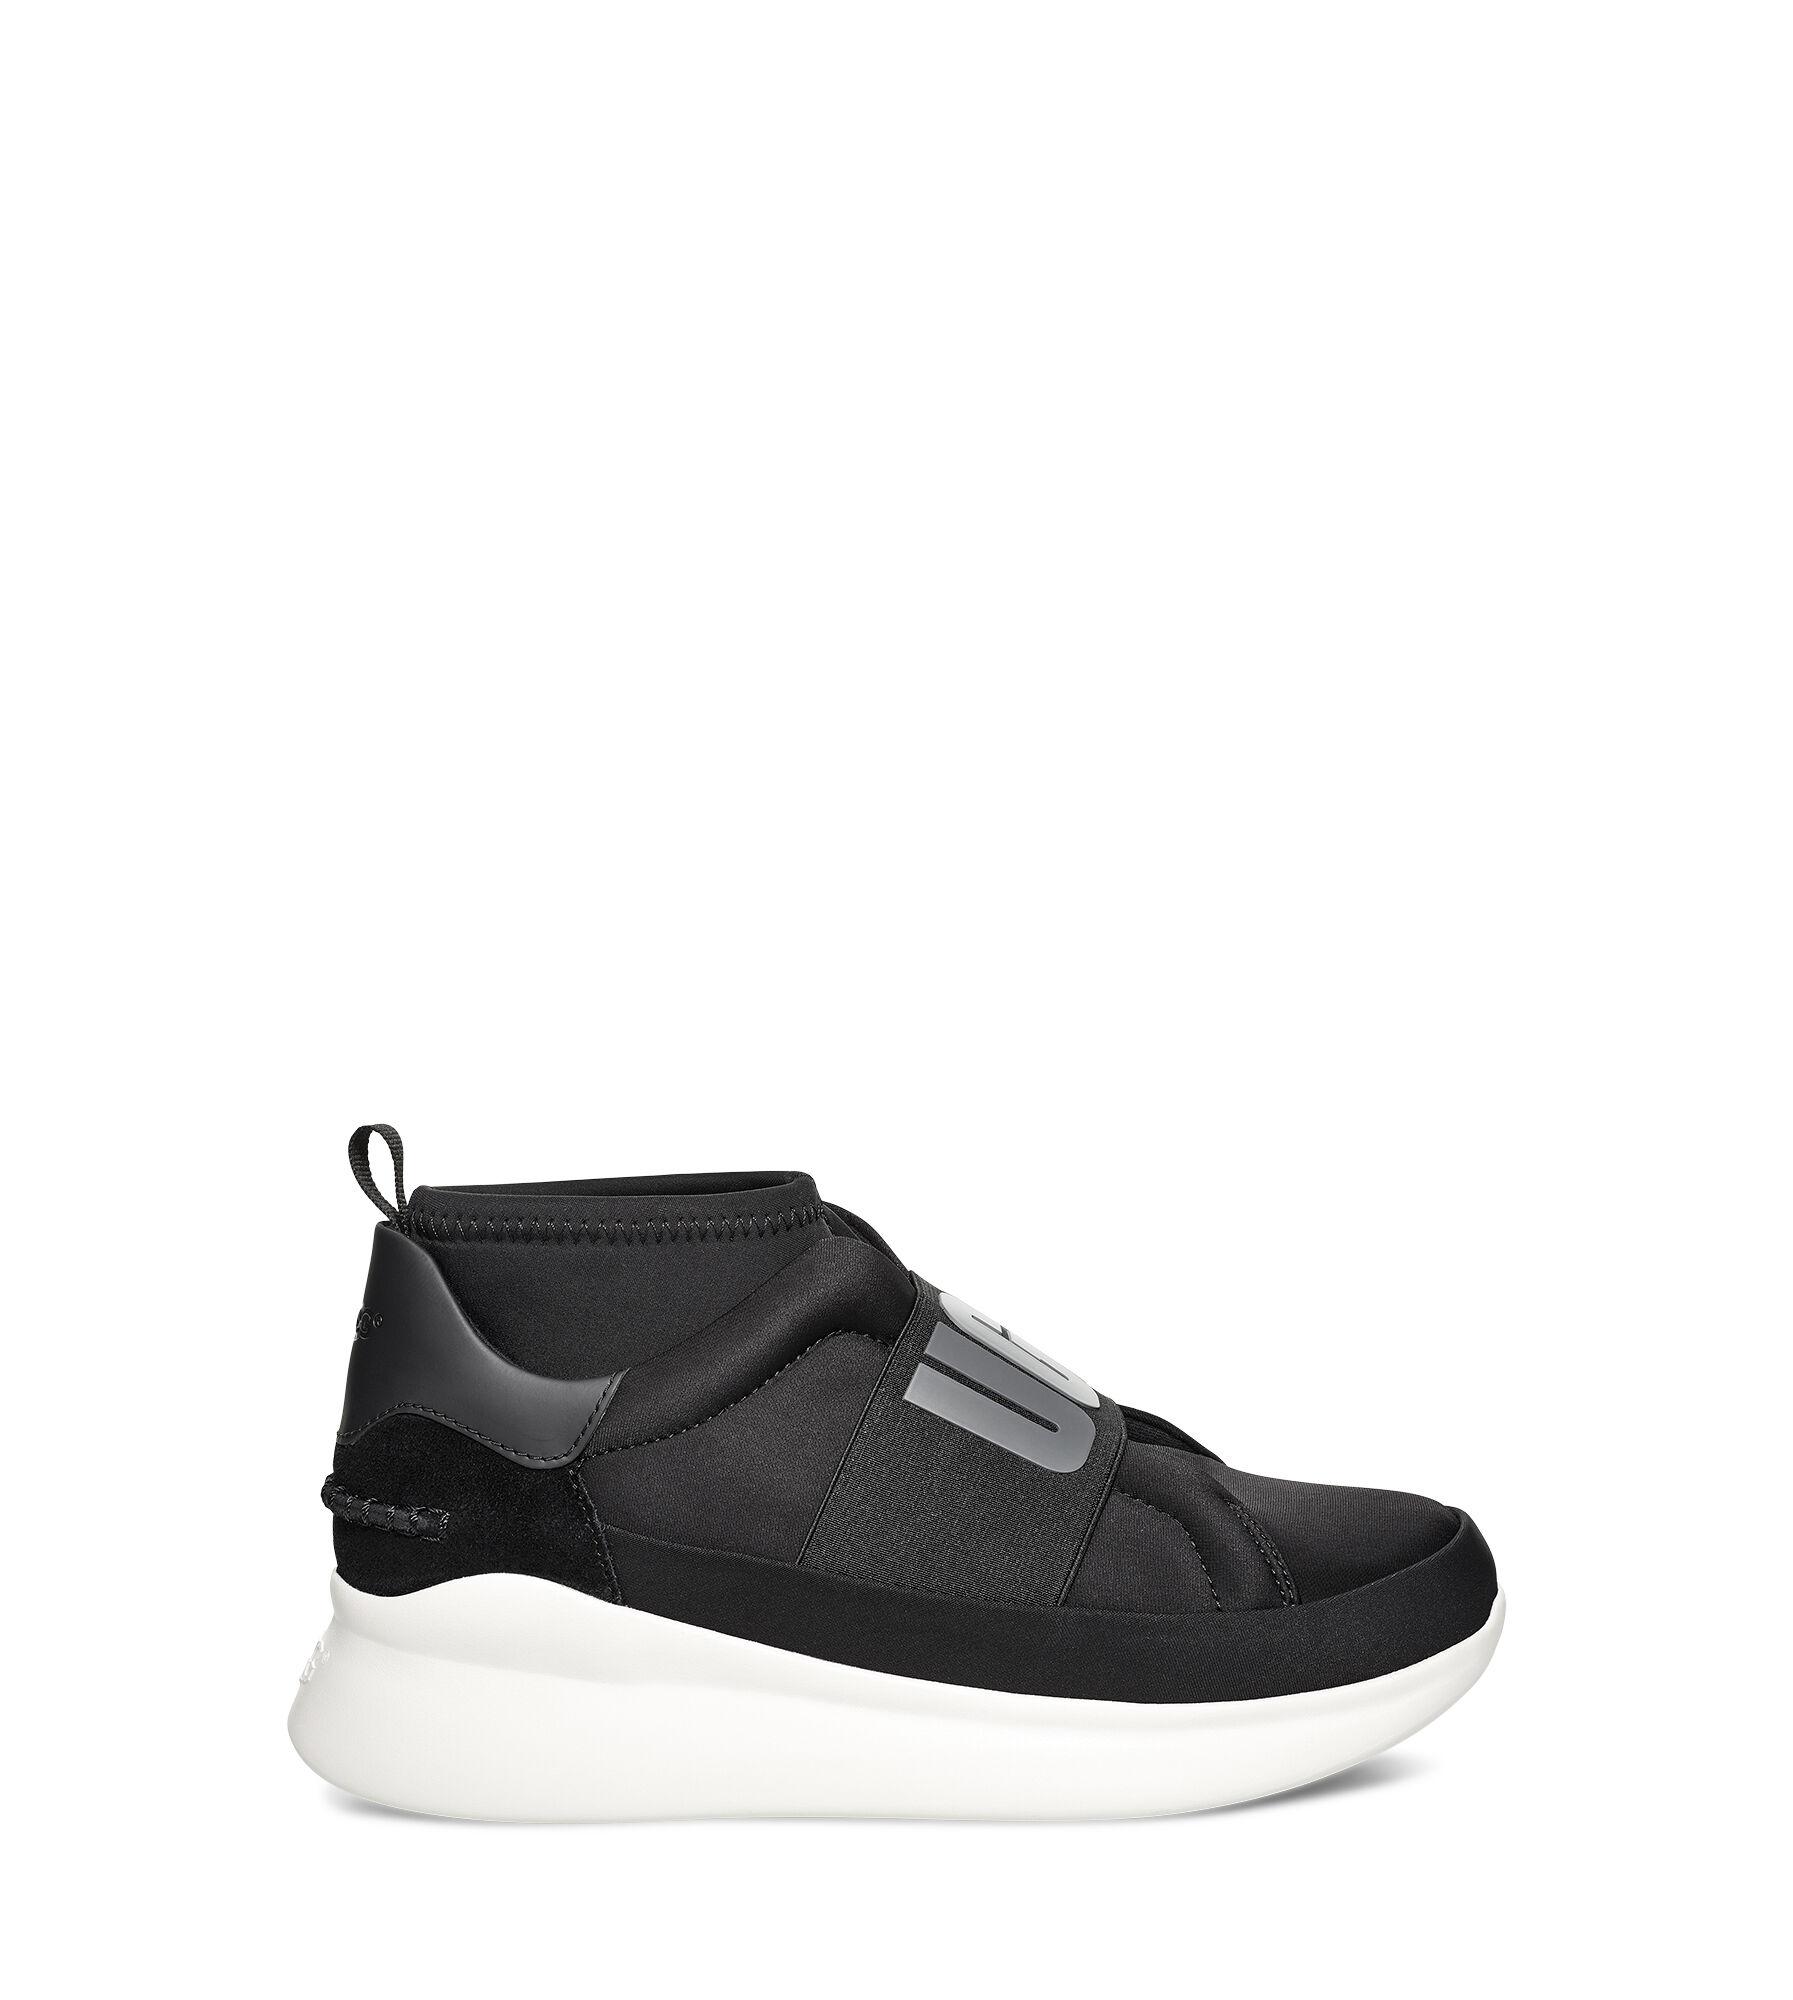 Womens Black Slip On Tennis Shoes